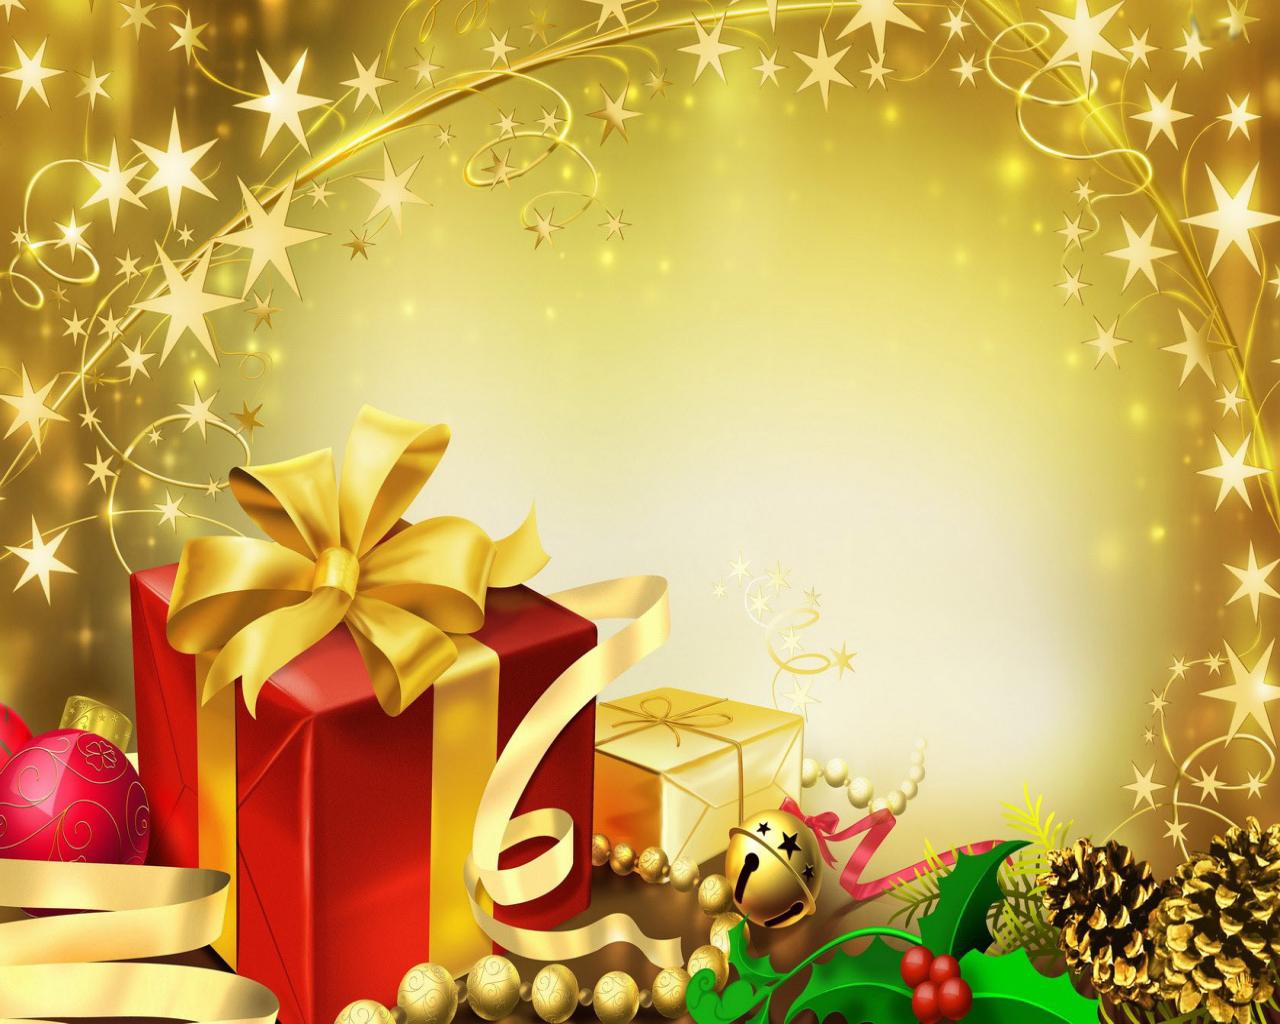 Christmas Present Desktop Wallpaper 1280x1024